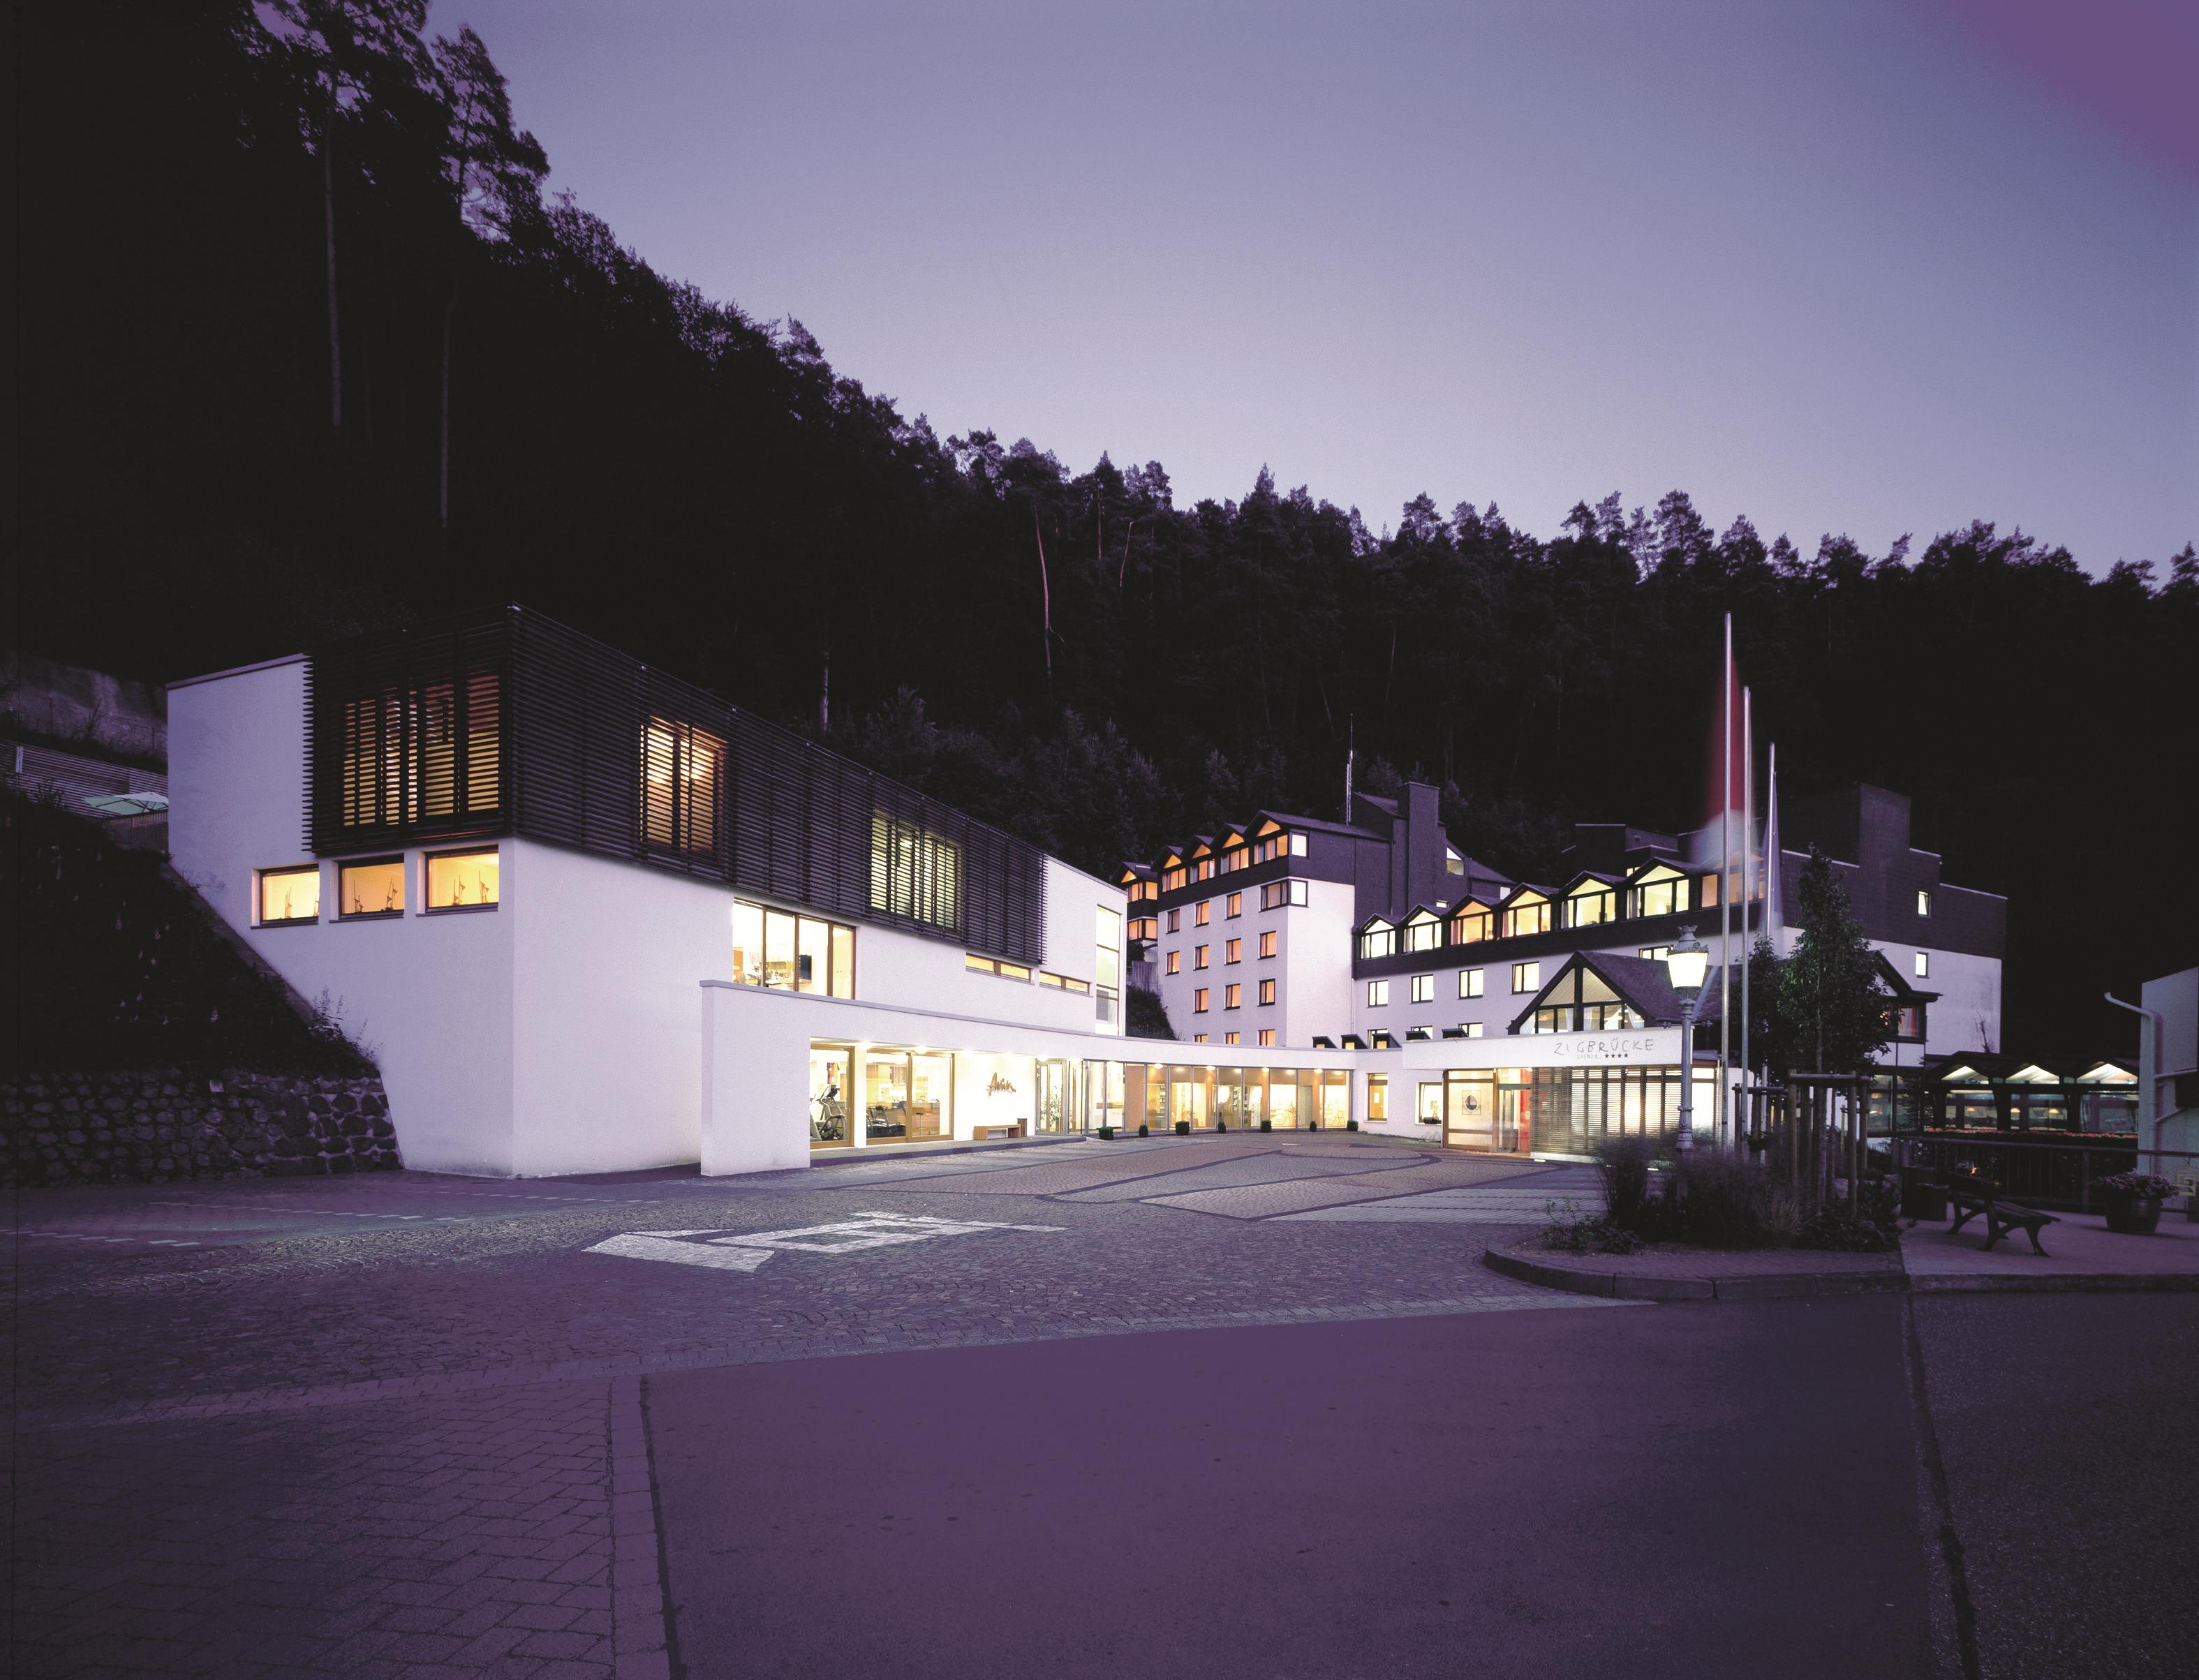 Hotel zugbr cke responsive design hotel webseite for Design hotel eifel euskirchen germany